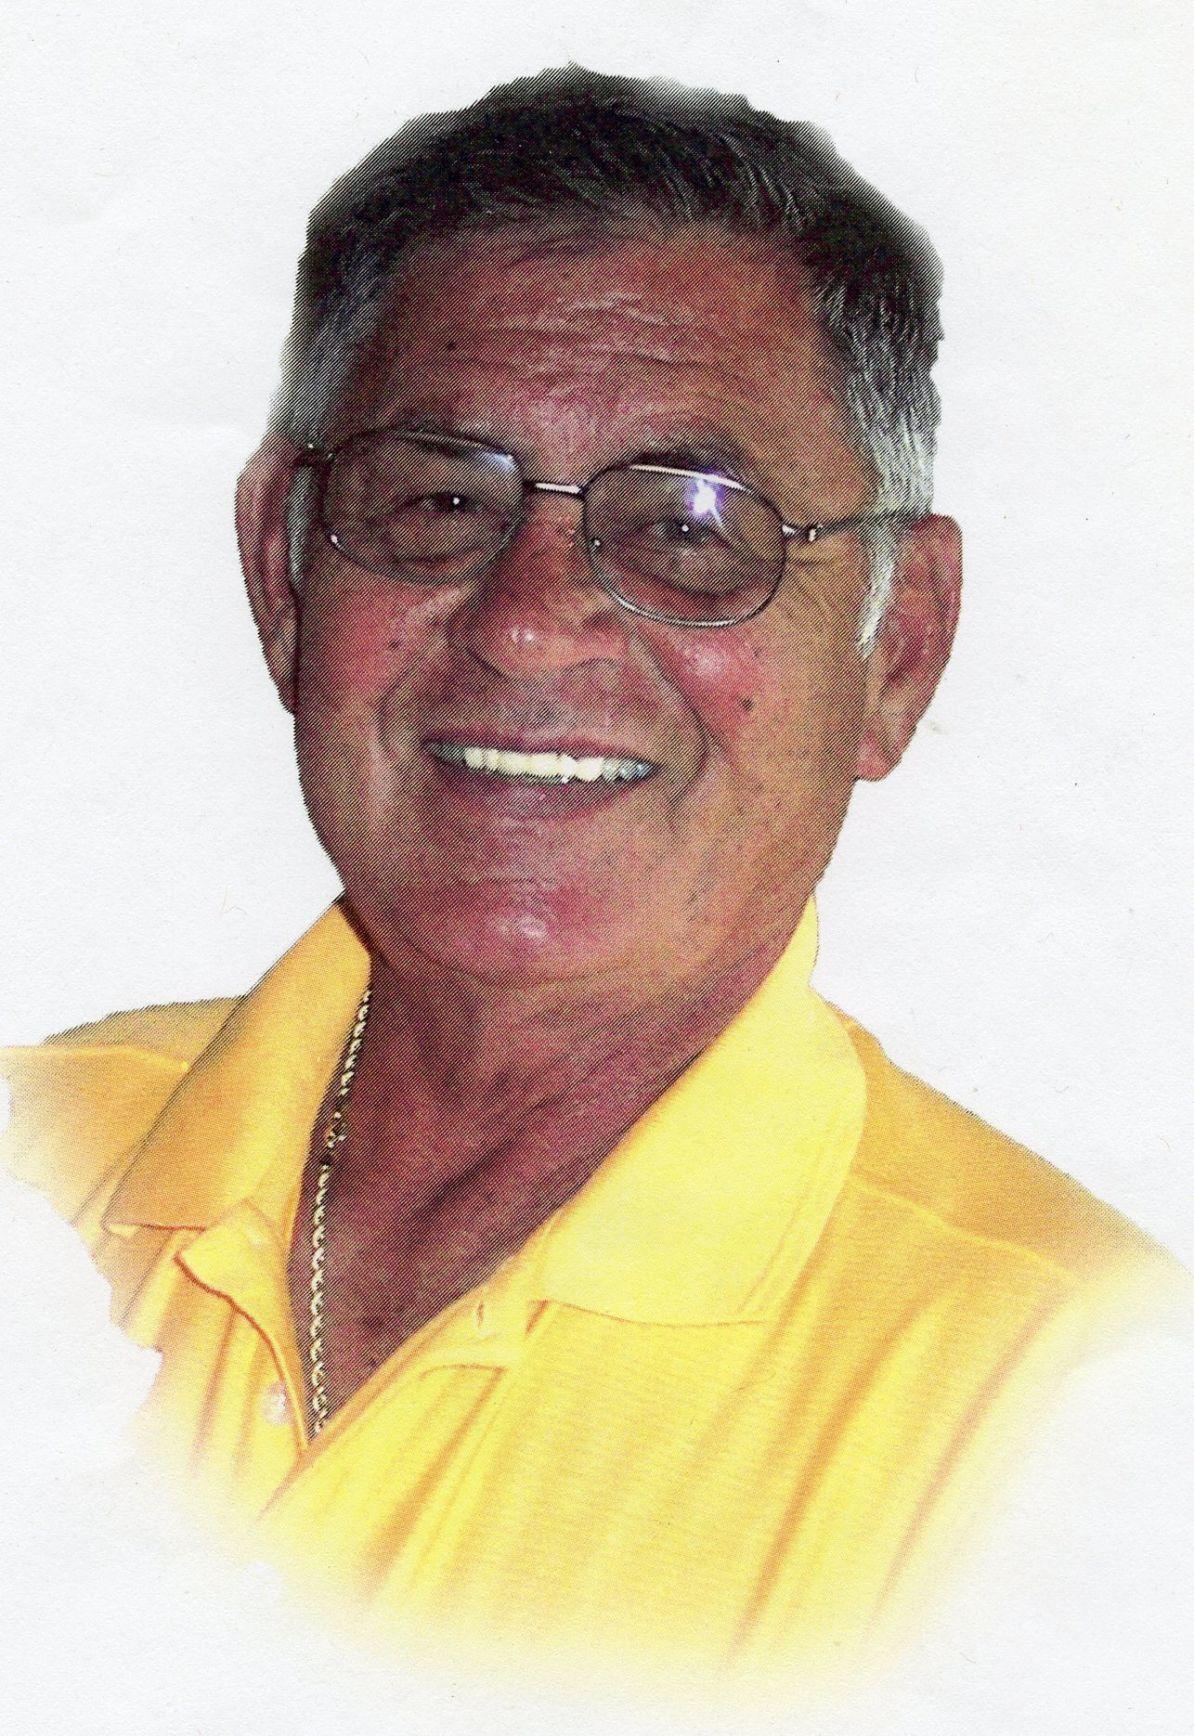 Charles 'Denny' Orr